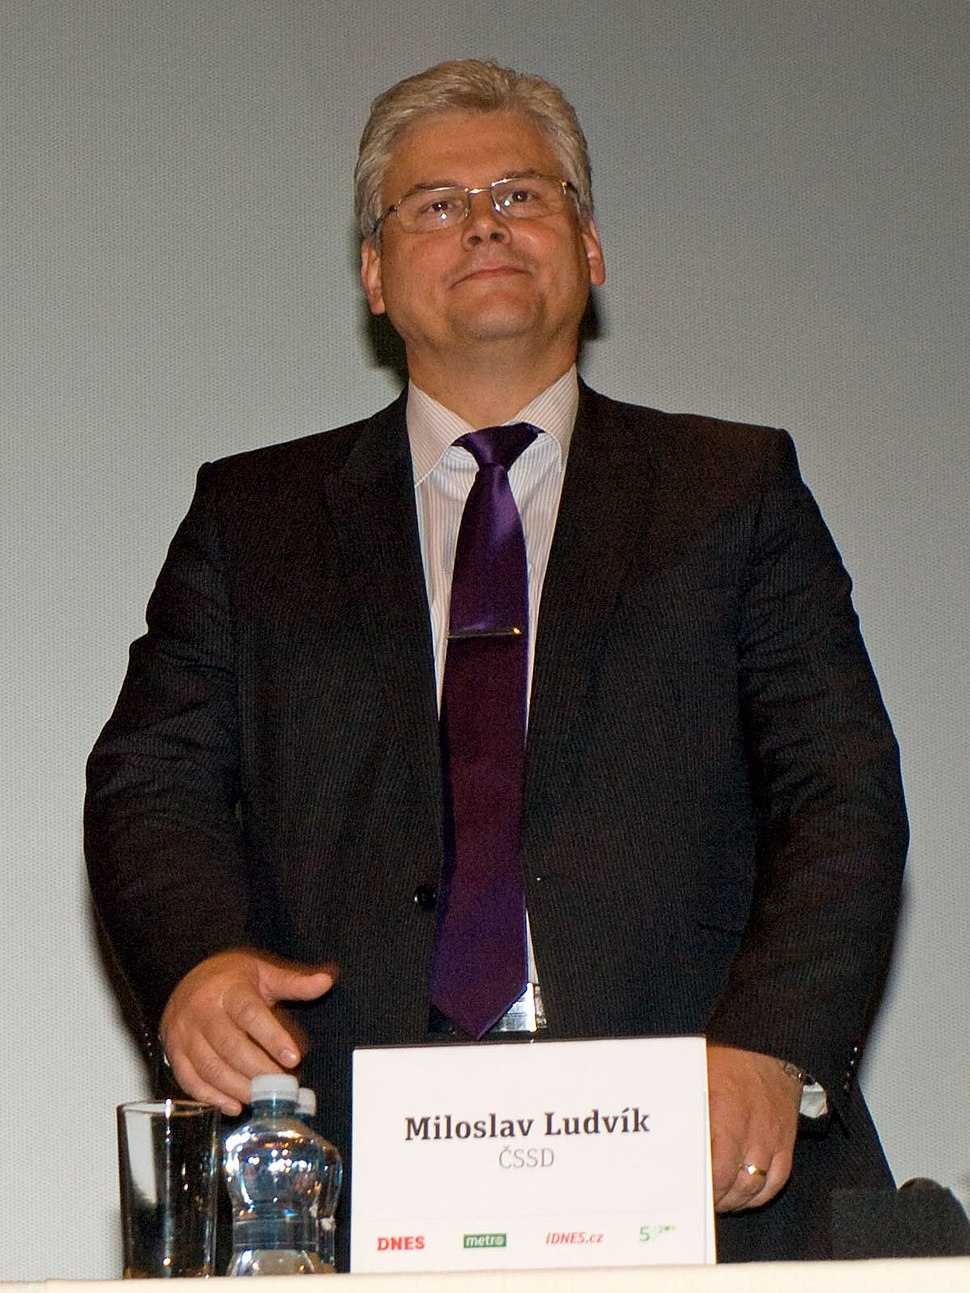 Miloslav Ludvík 2014-09-29 3753